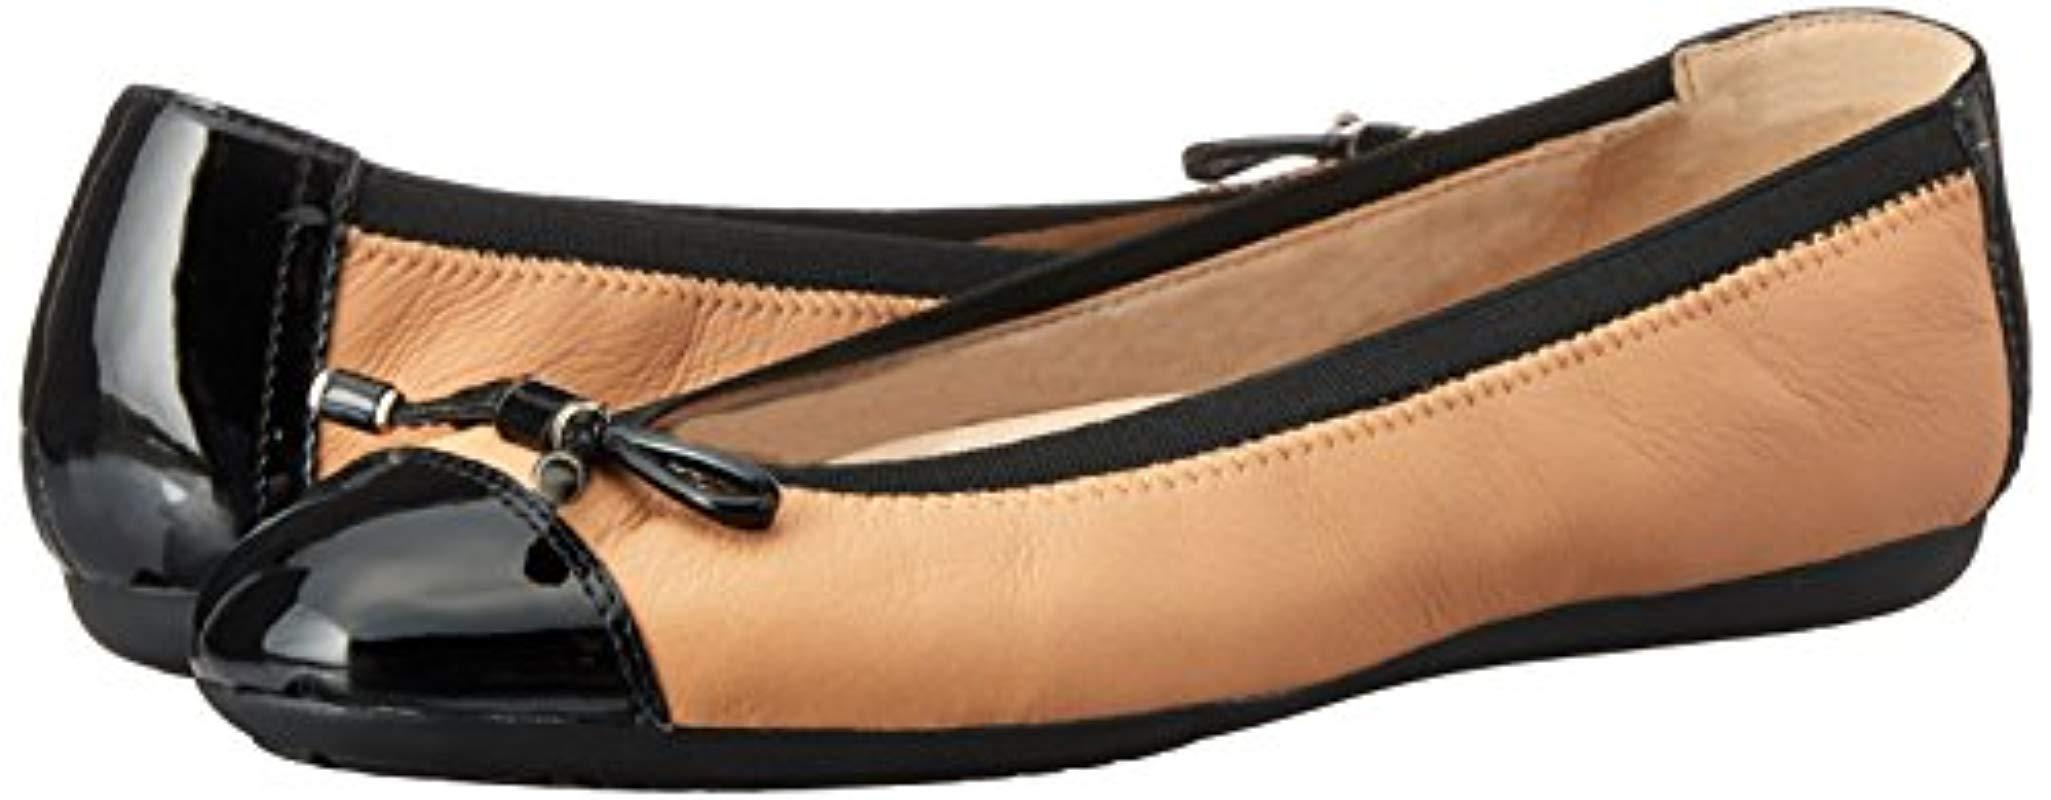 Geox Womens Wlola2fit1 Ballet Flat